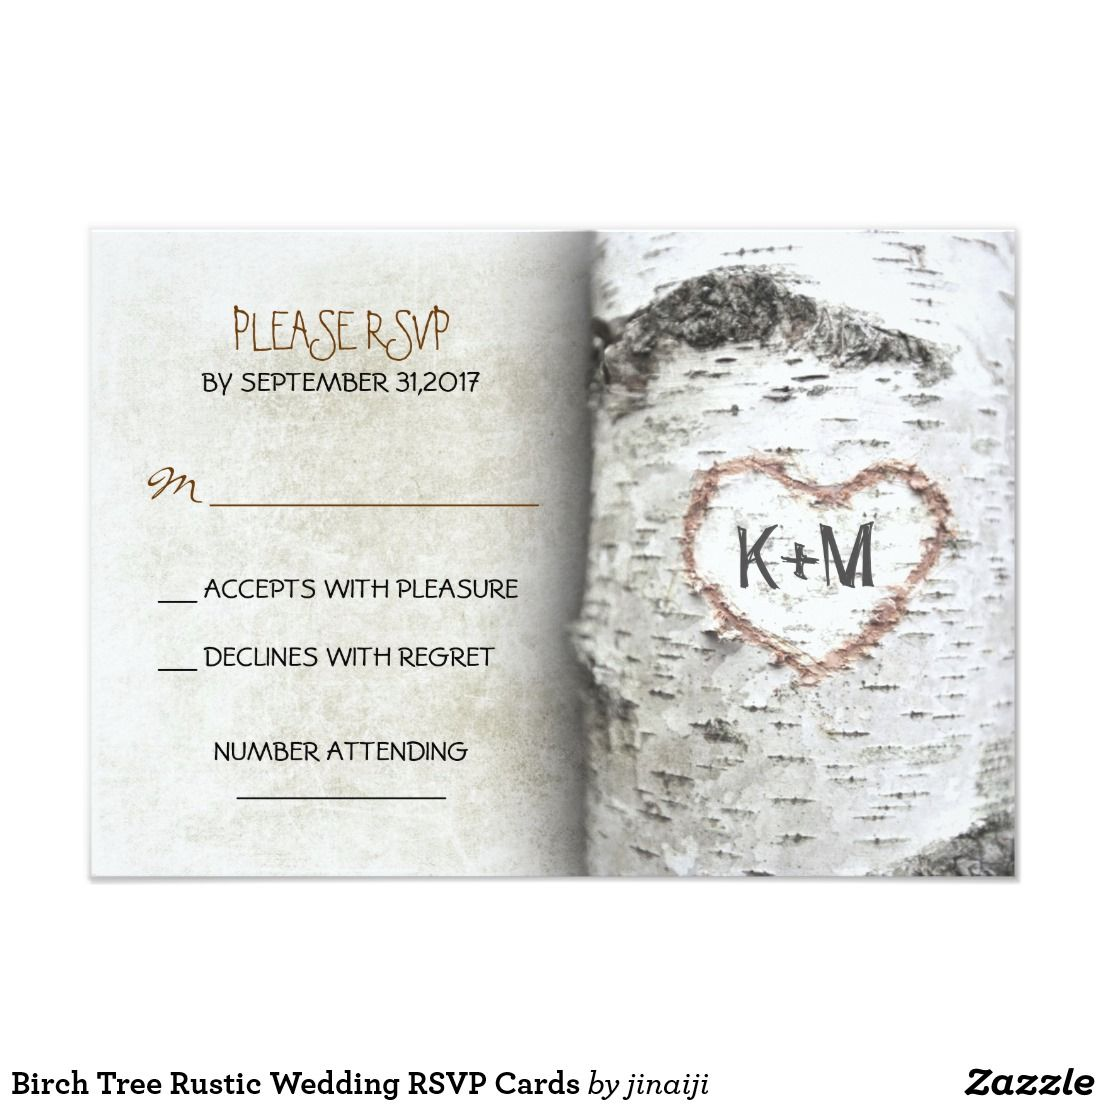 Birch Tree Rustic Wedding Rsvp Cards Wedding Rsvp Rsvp And